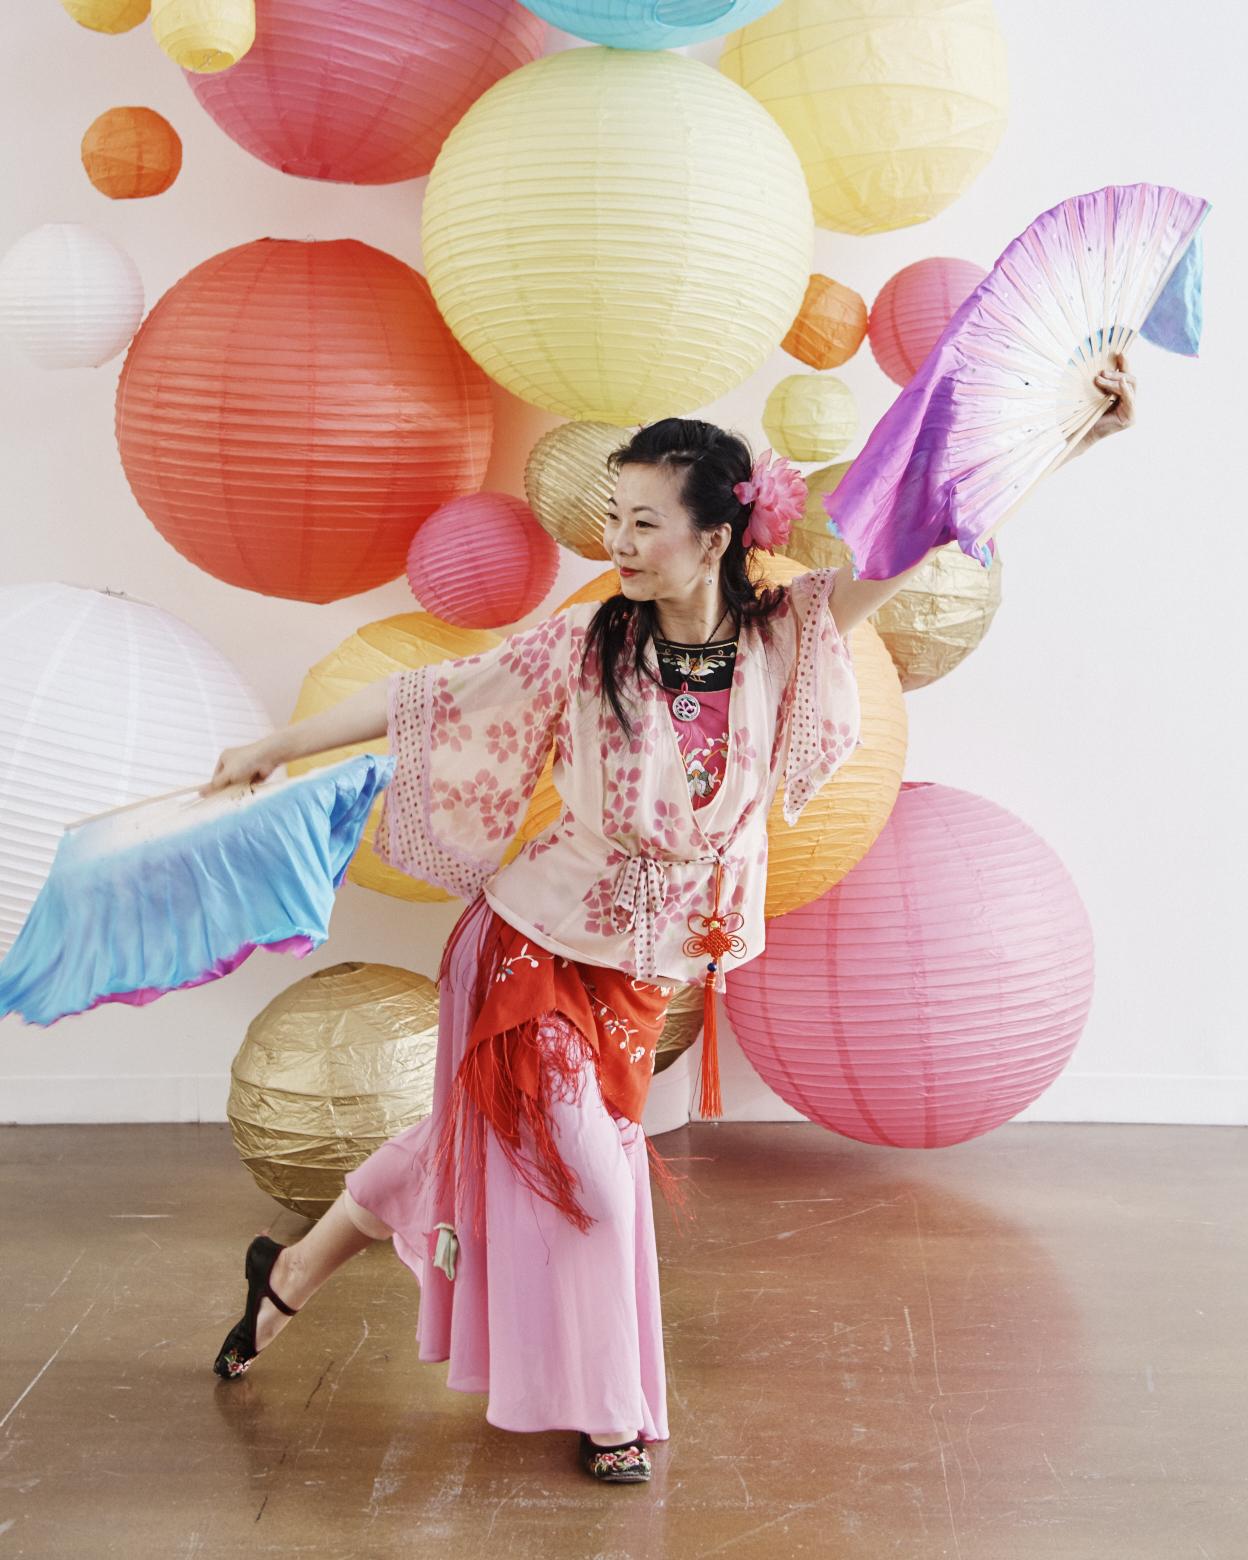 dancers-0476-LP-6304870.jpg